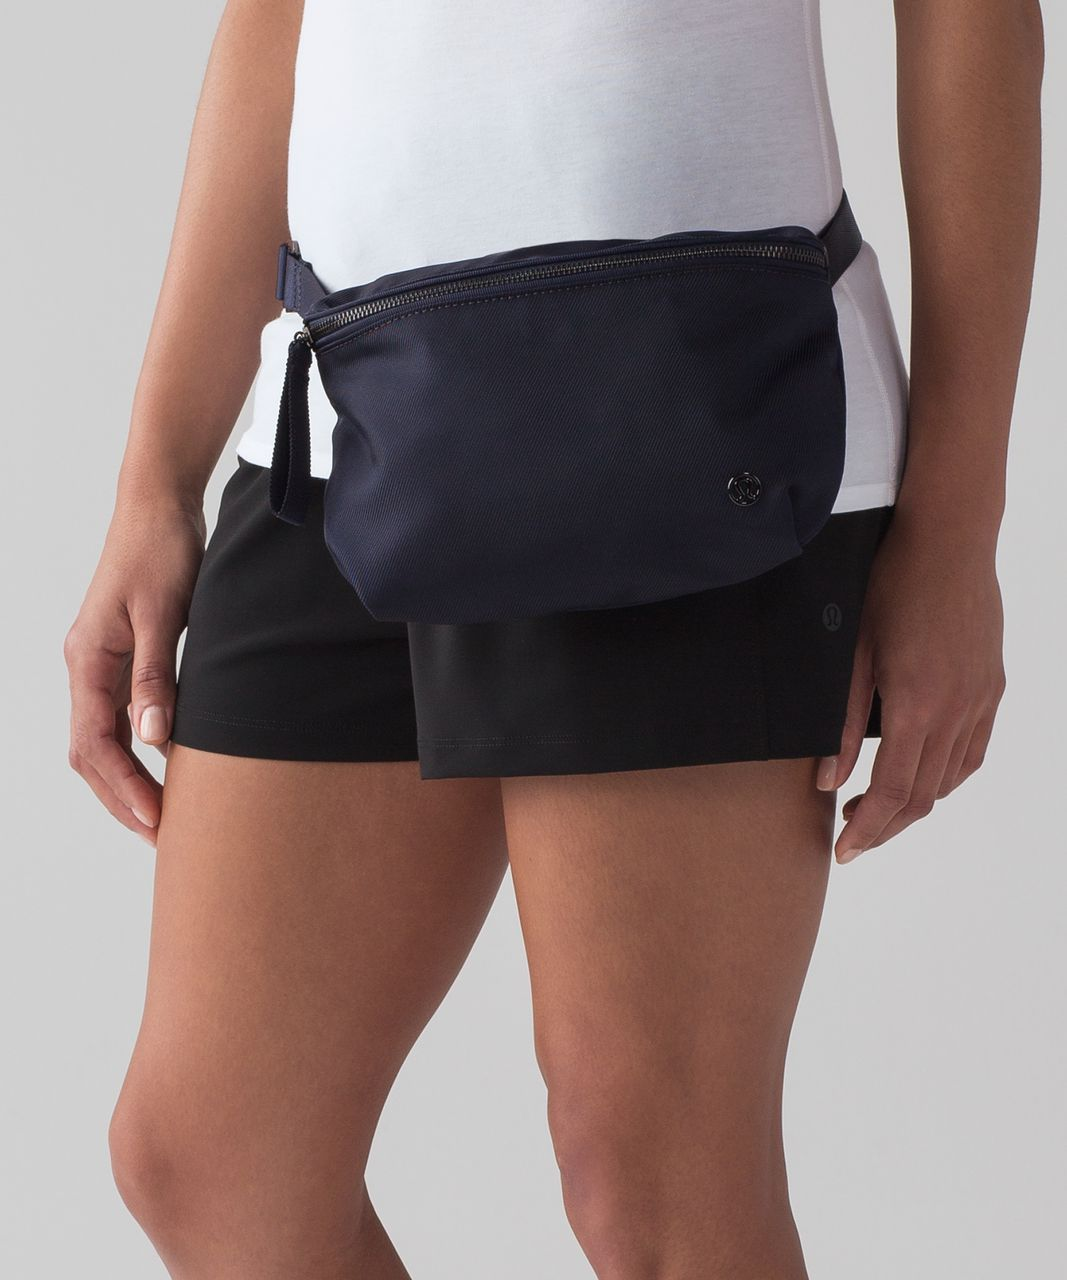 Lululemon Go Lightly Belt Bag Midnight Navy Lulu Fanatics